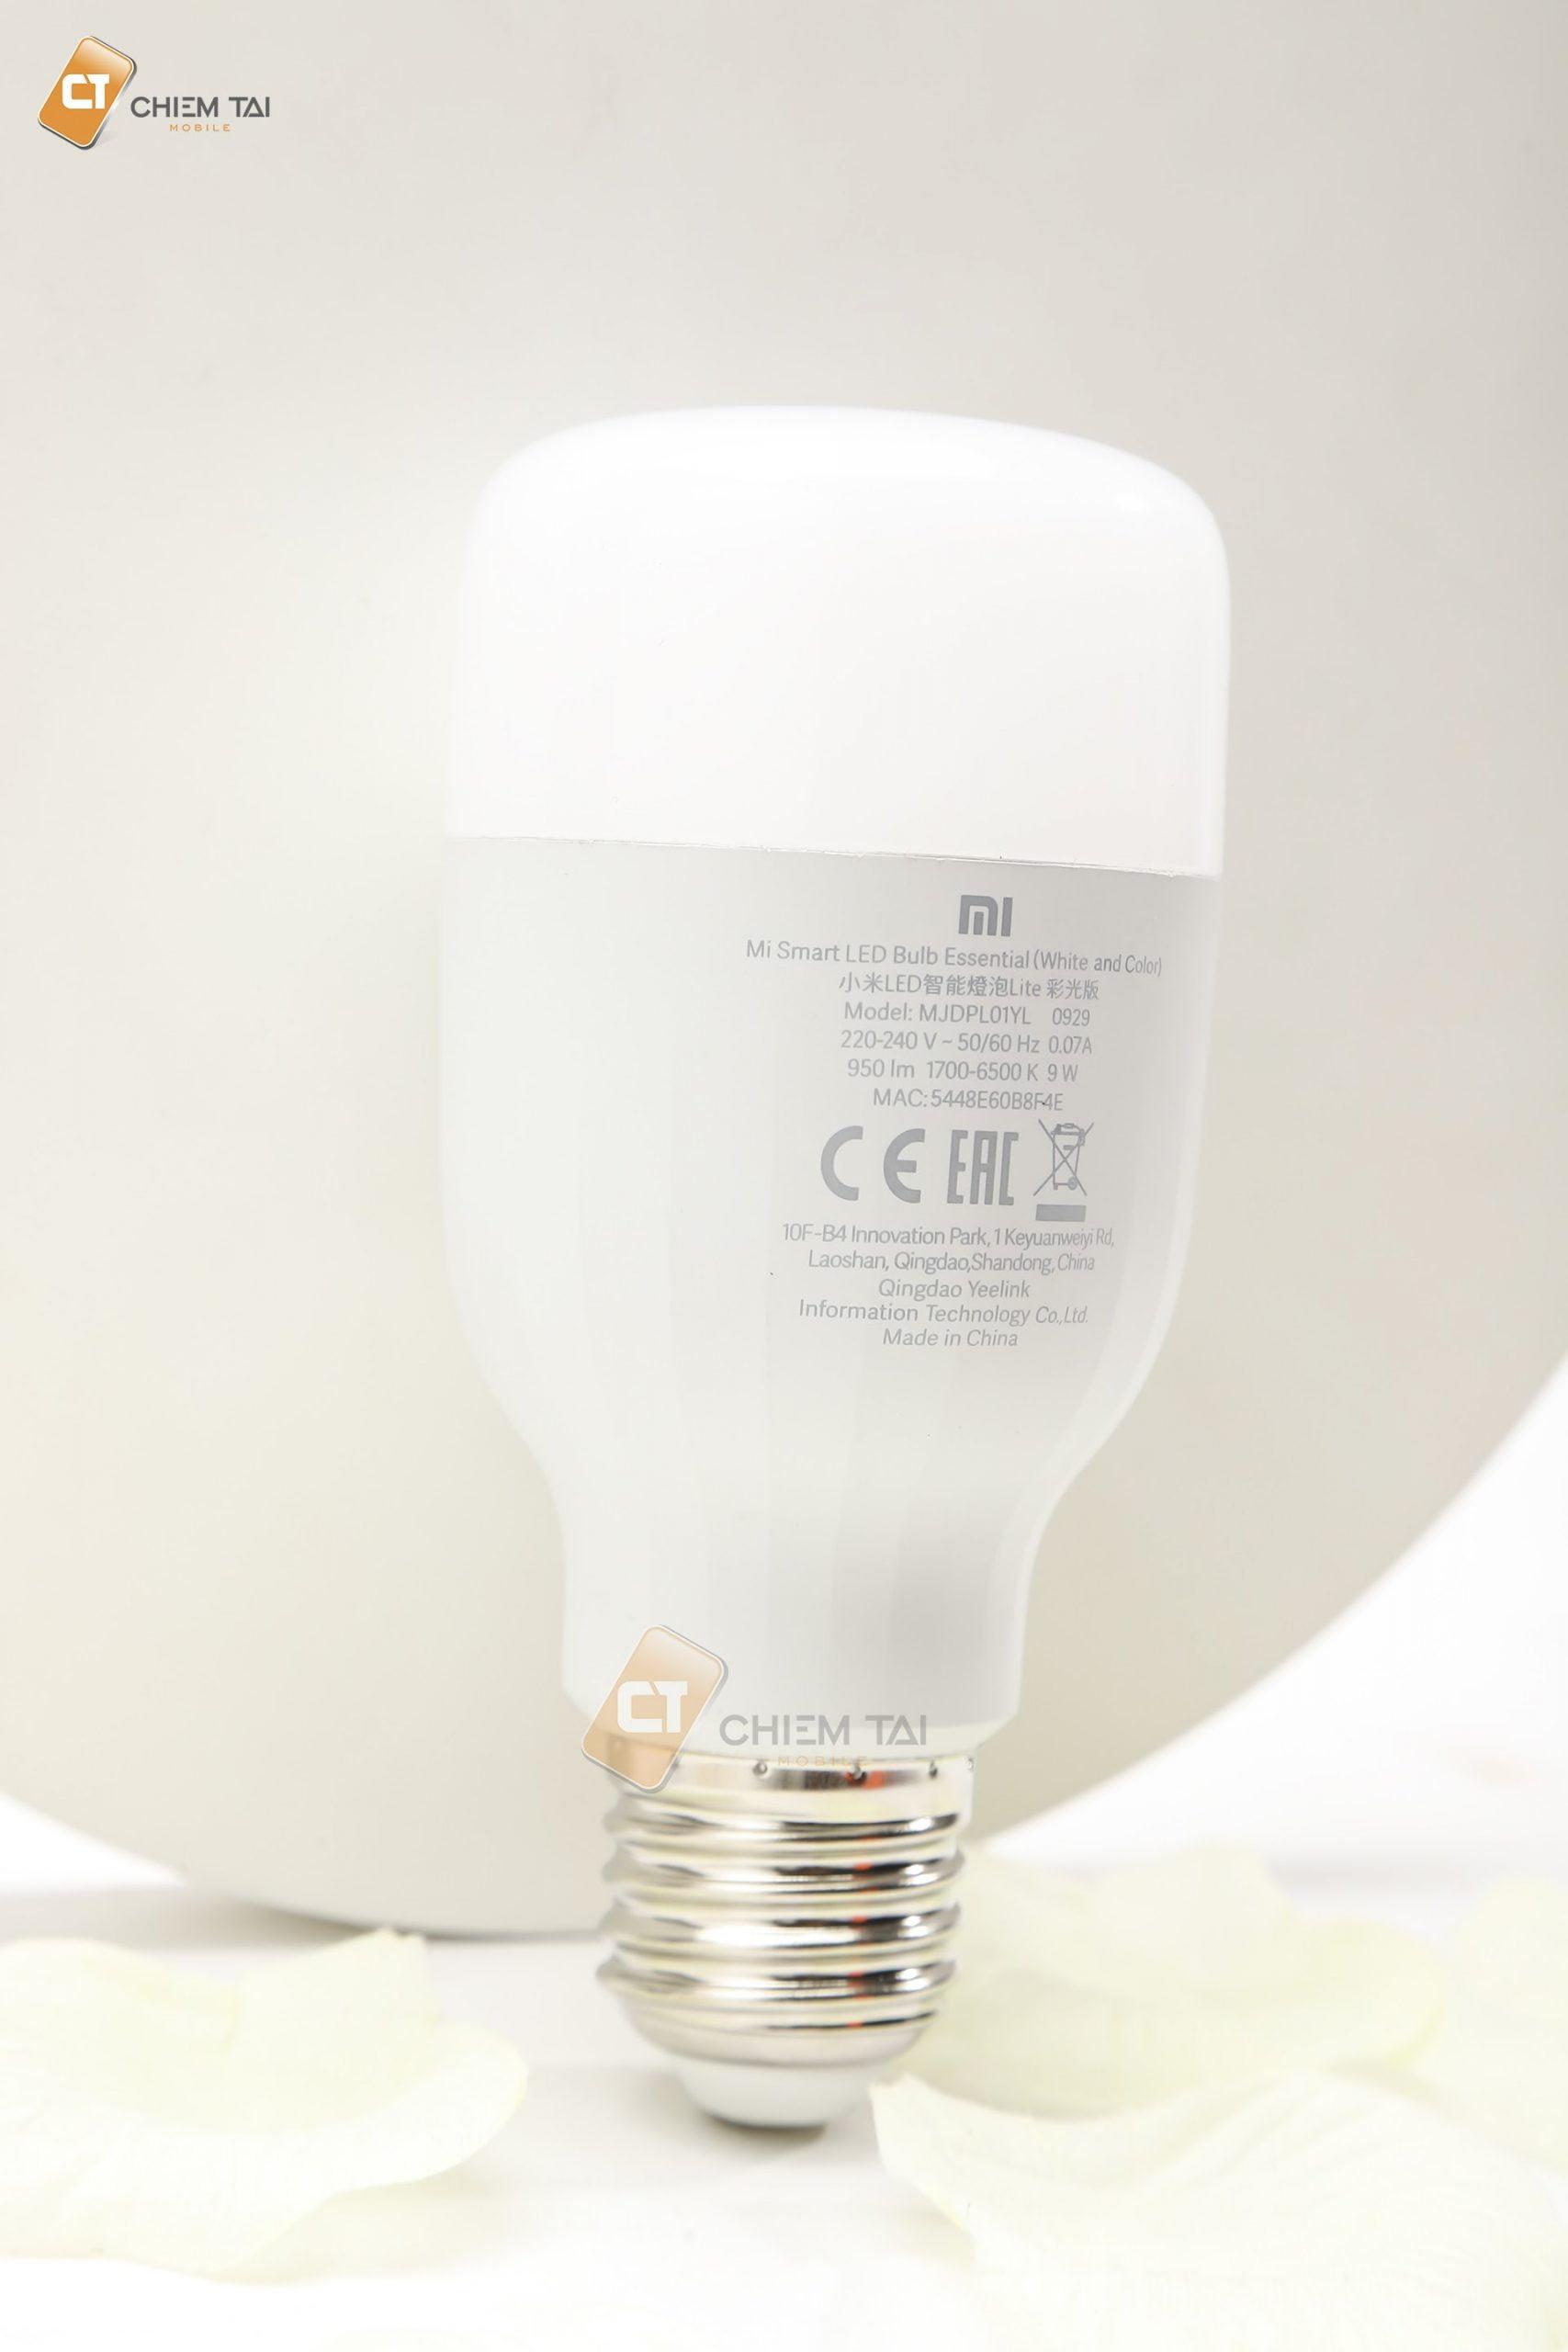 bong den led thong minh xiaomi bulb essential mjdpl01yl 6017b77fd4263 scaled